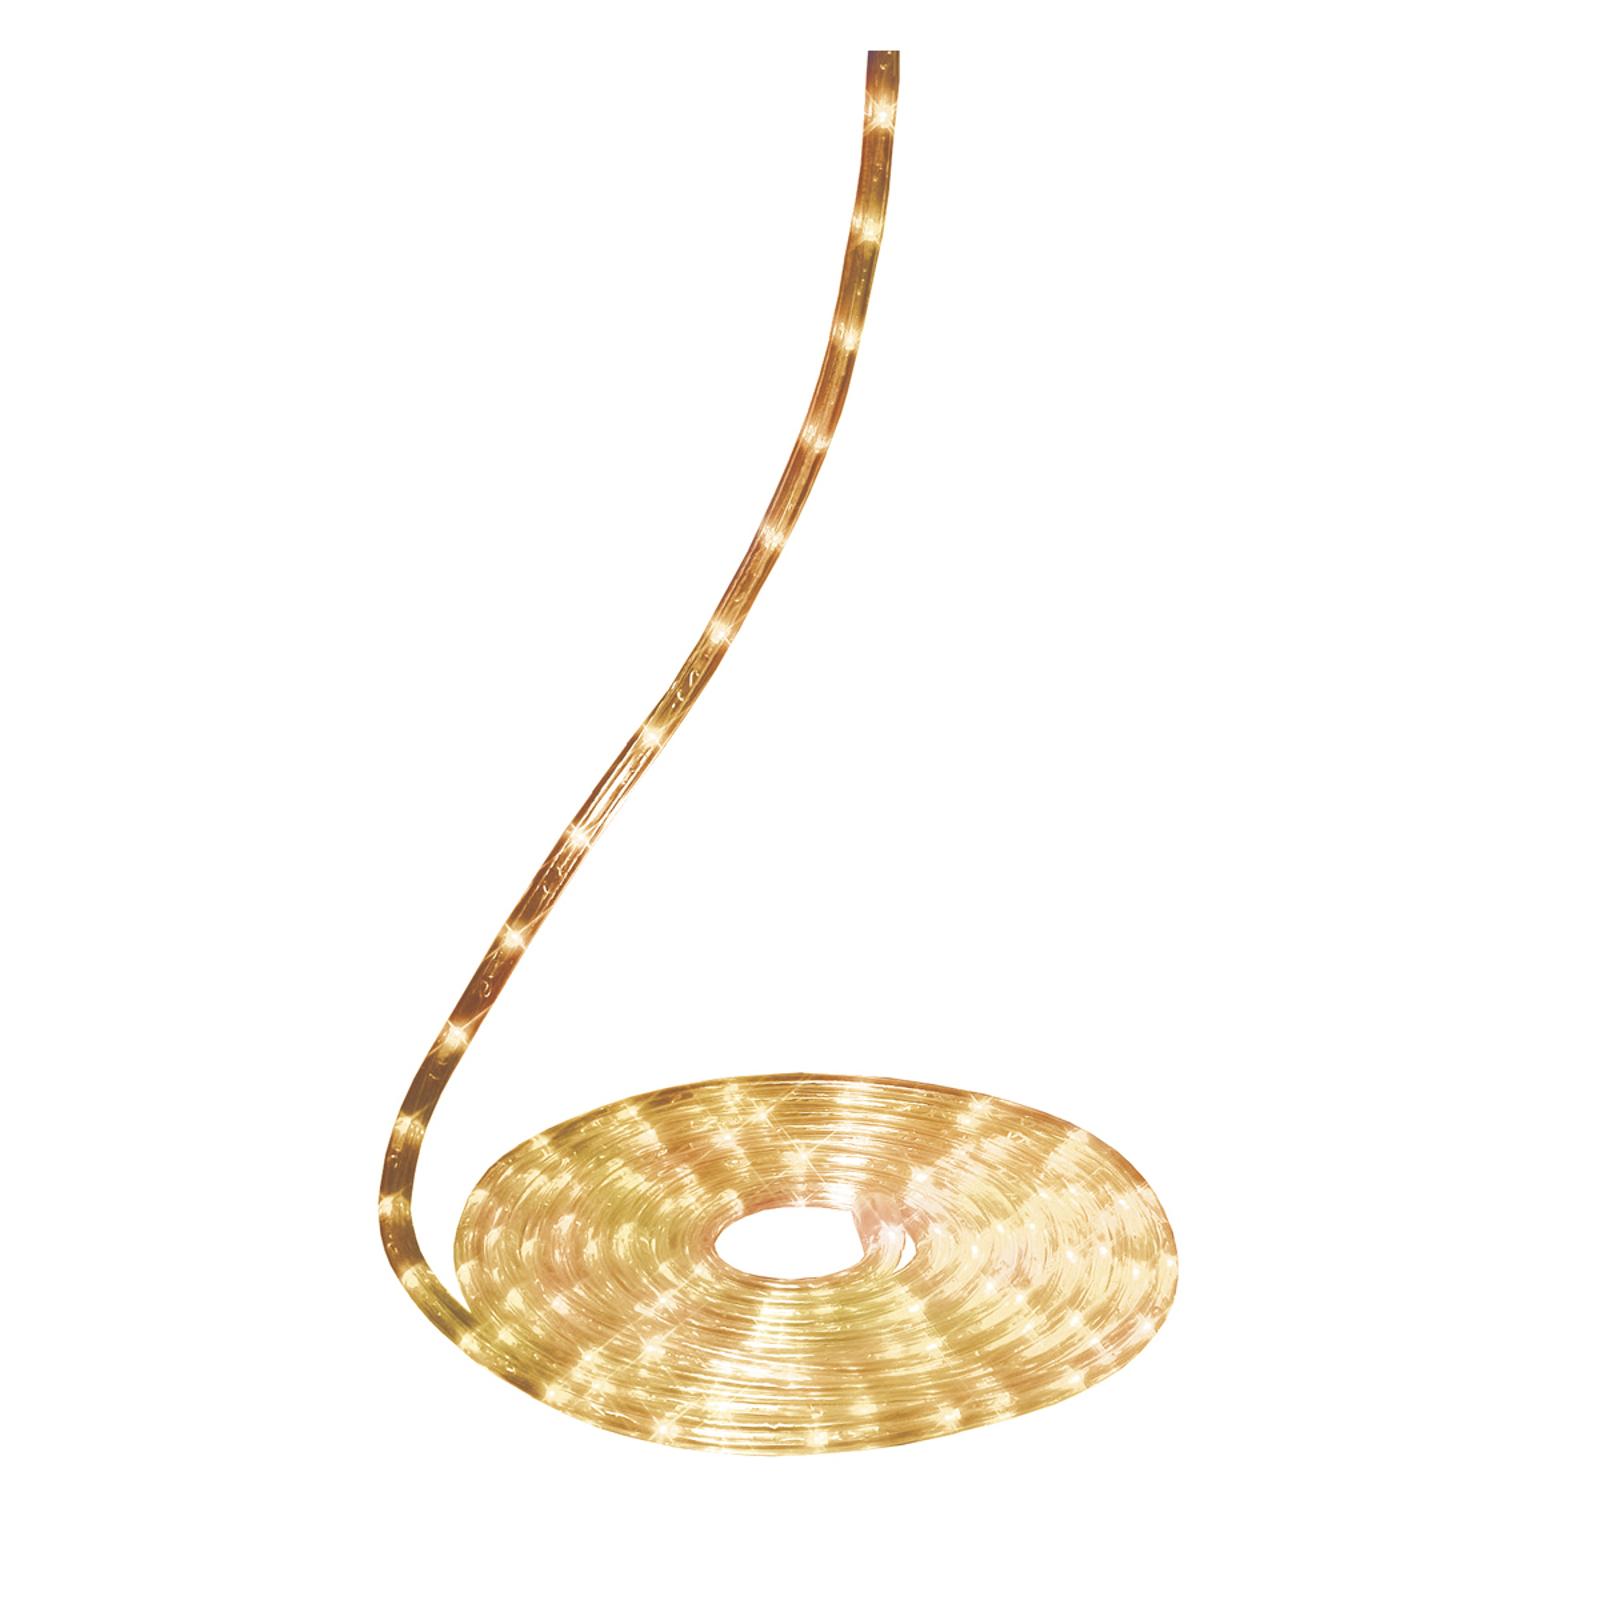 Micro světelná hadice Ropelight 6 m čirá